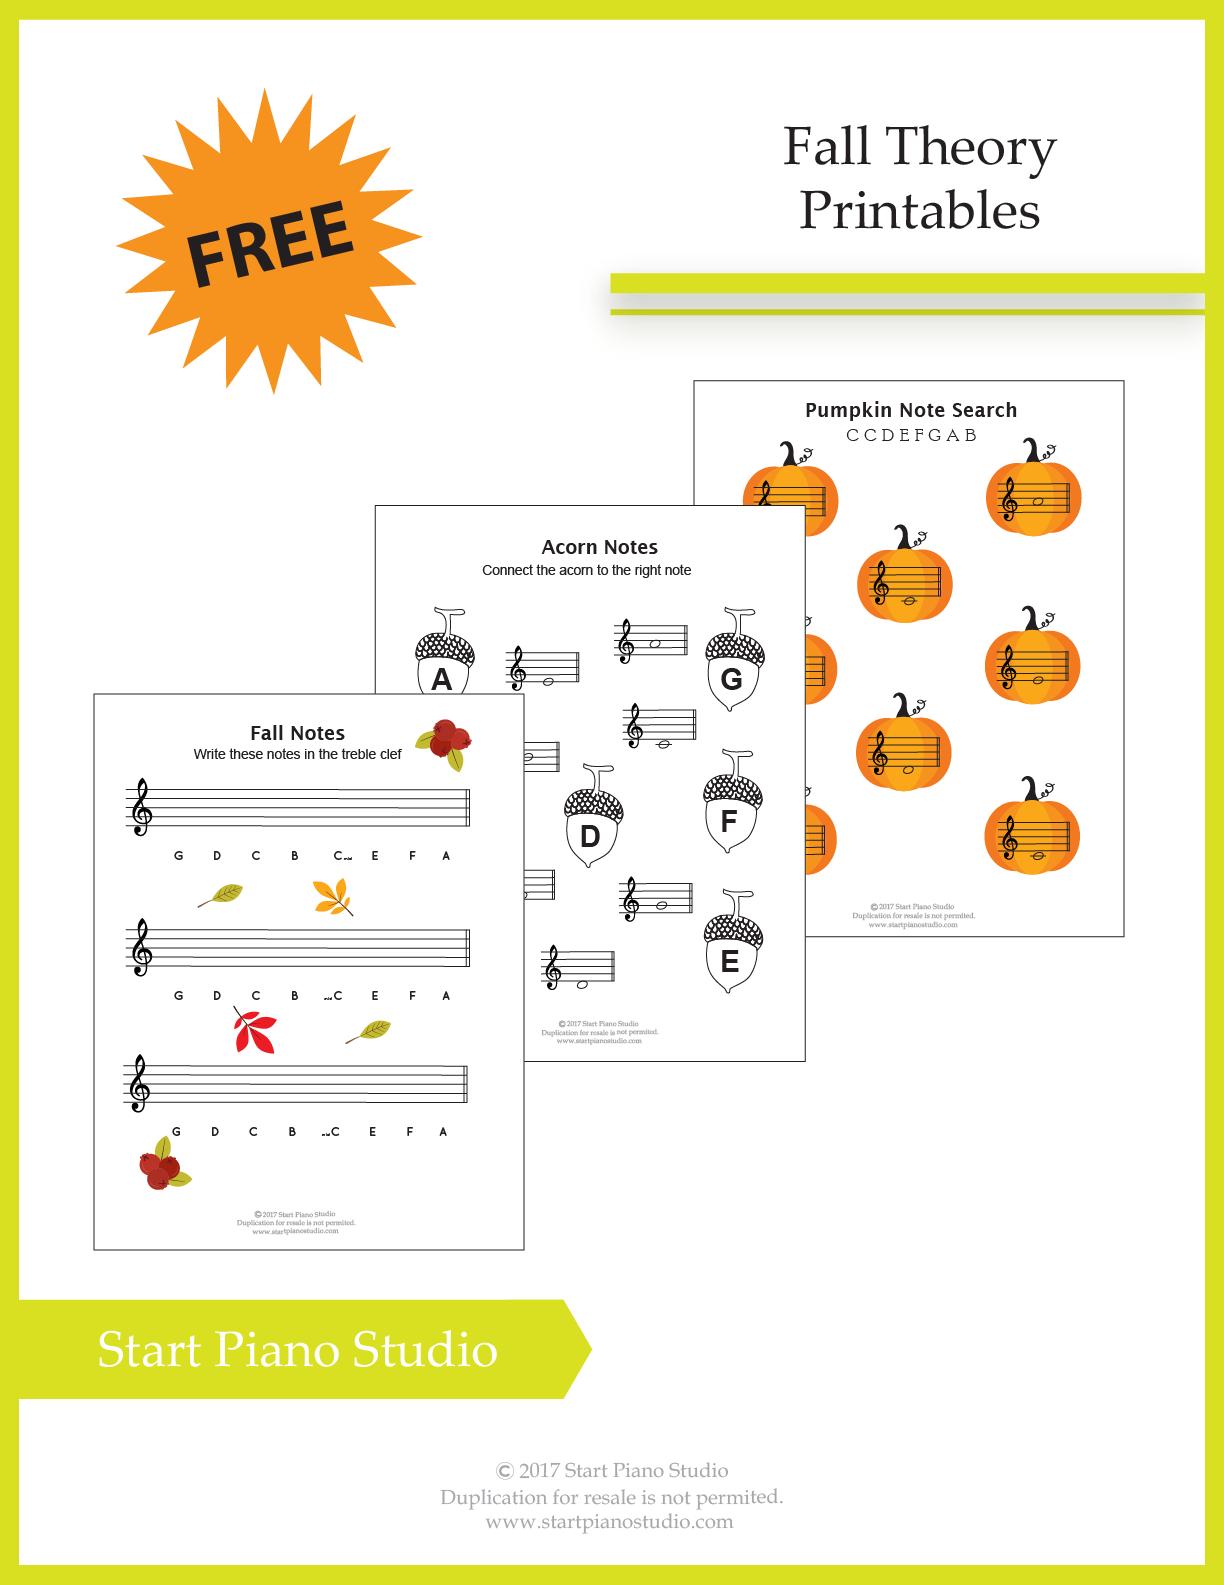 Fall Theory Printables